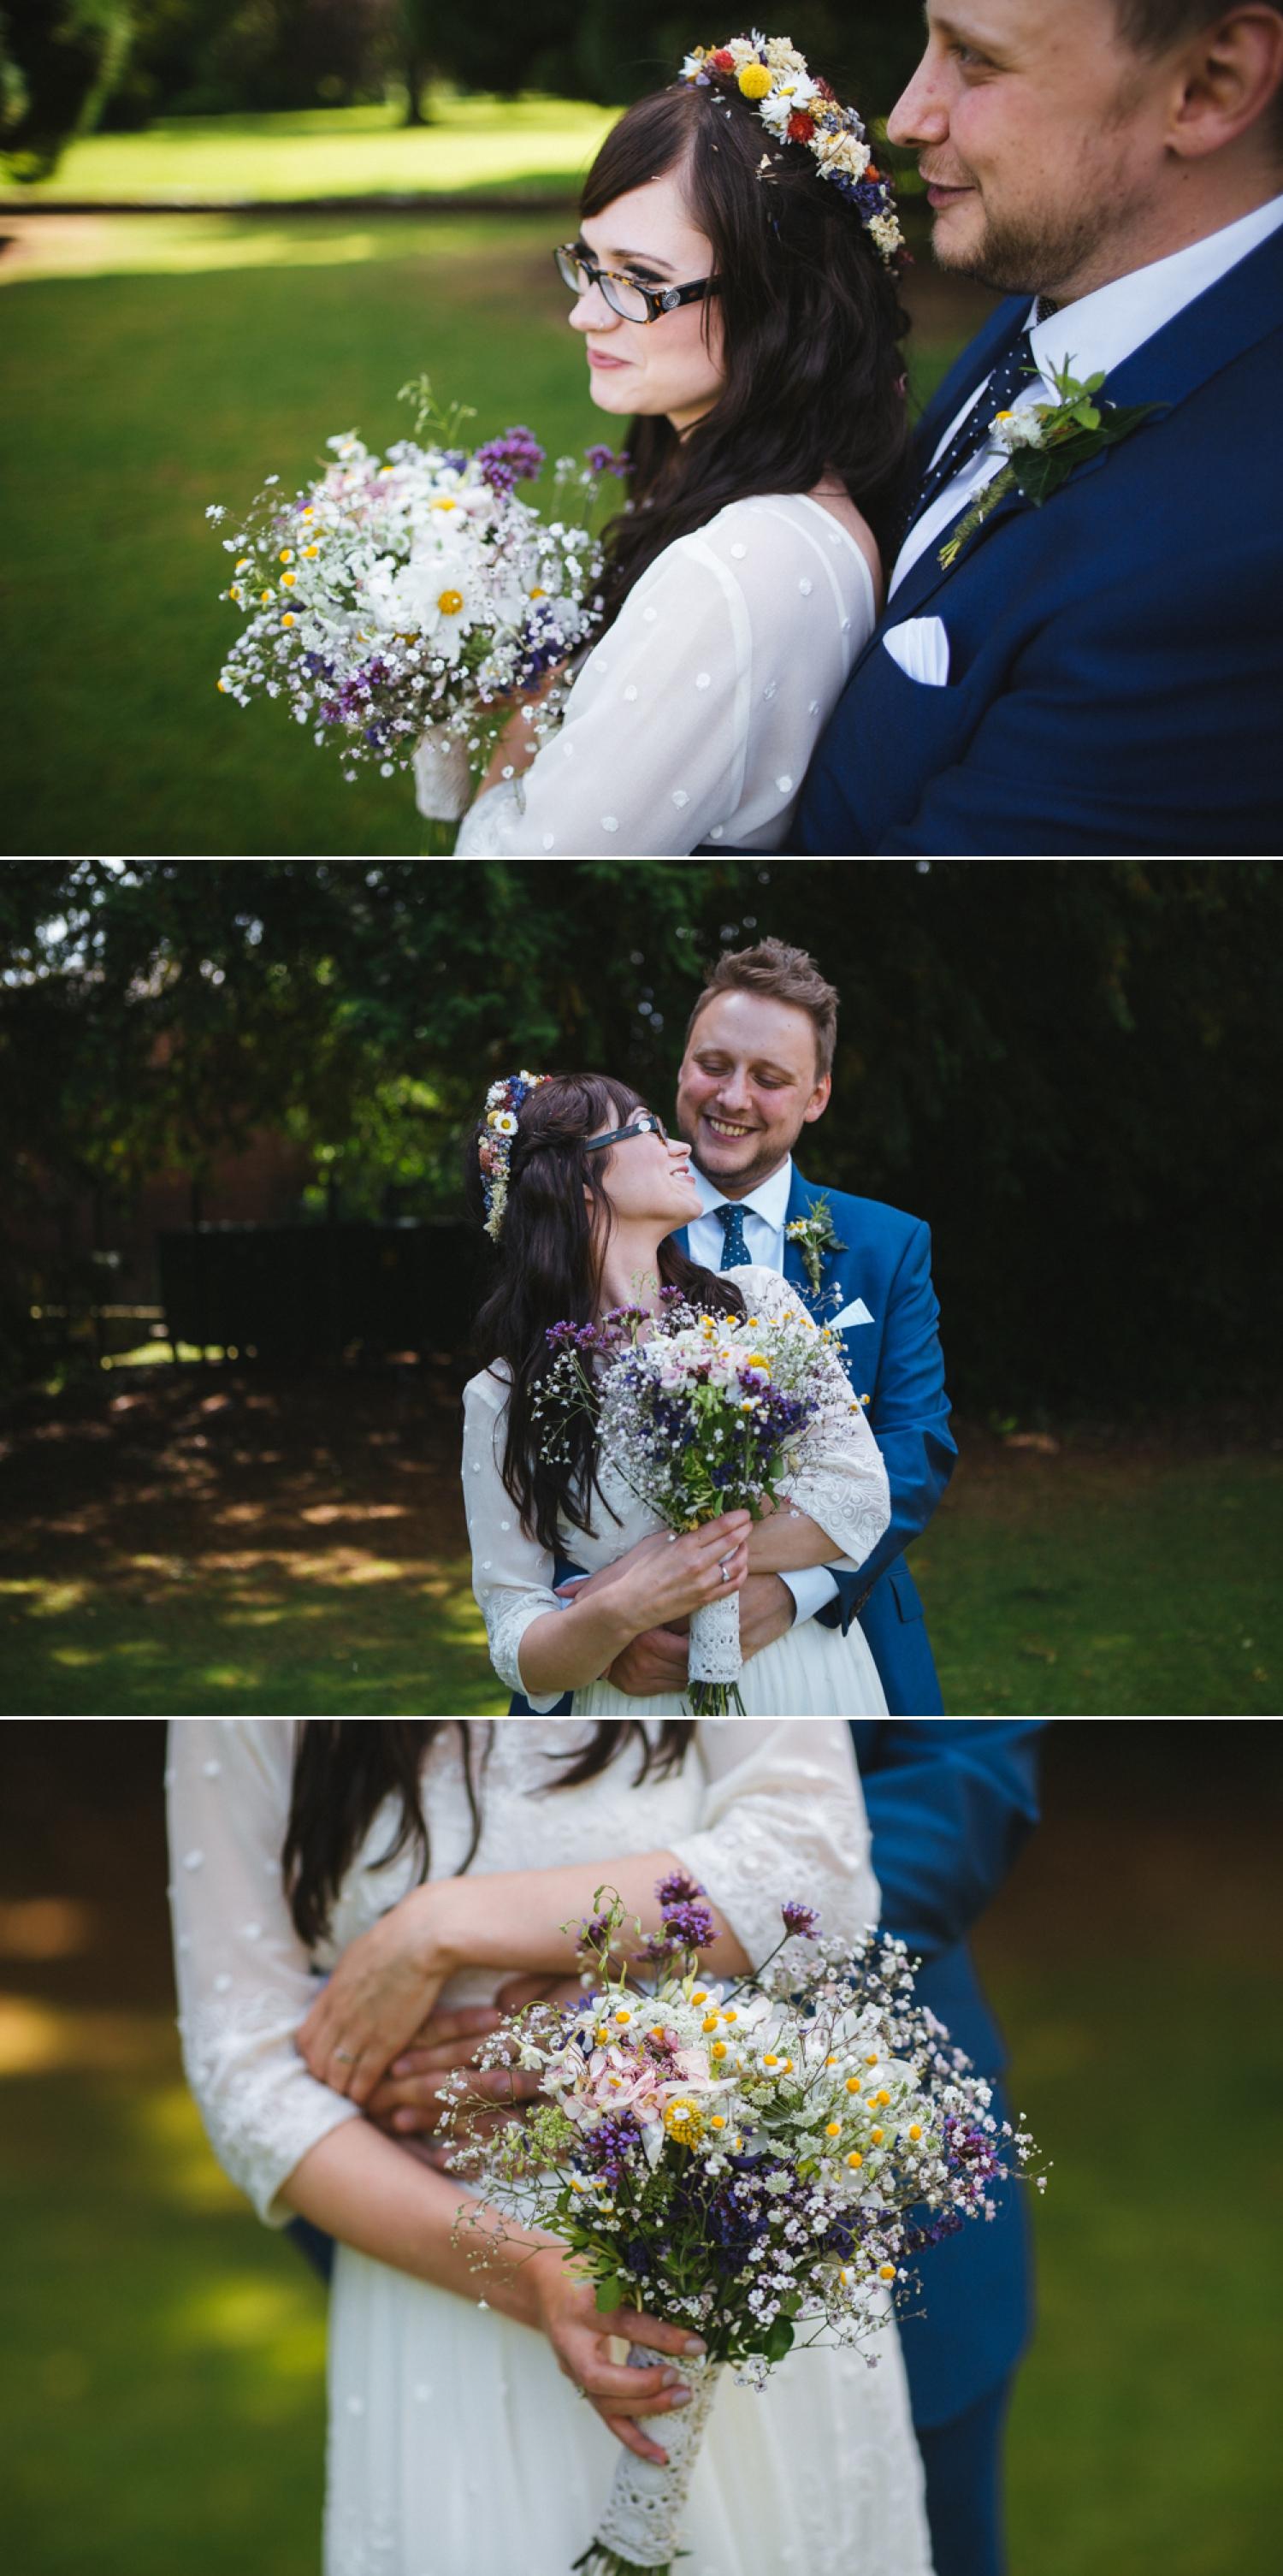 Somerset Wedding Photographer Elly & Liam_0020.jpg